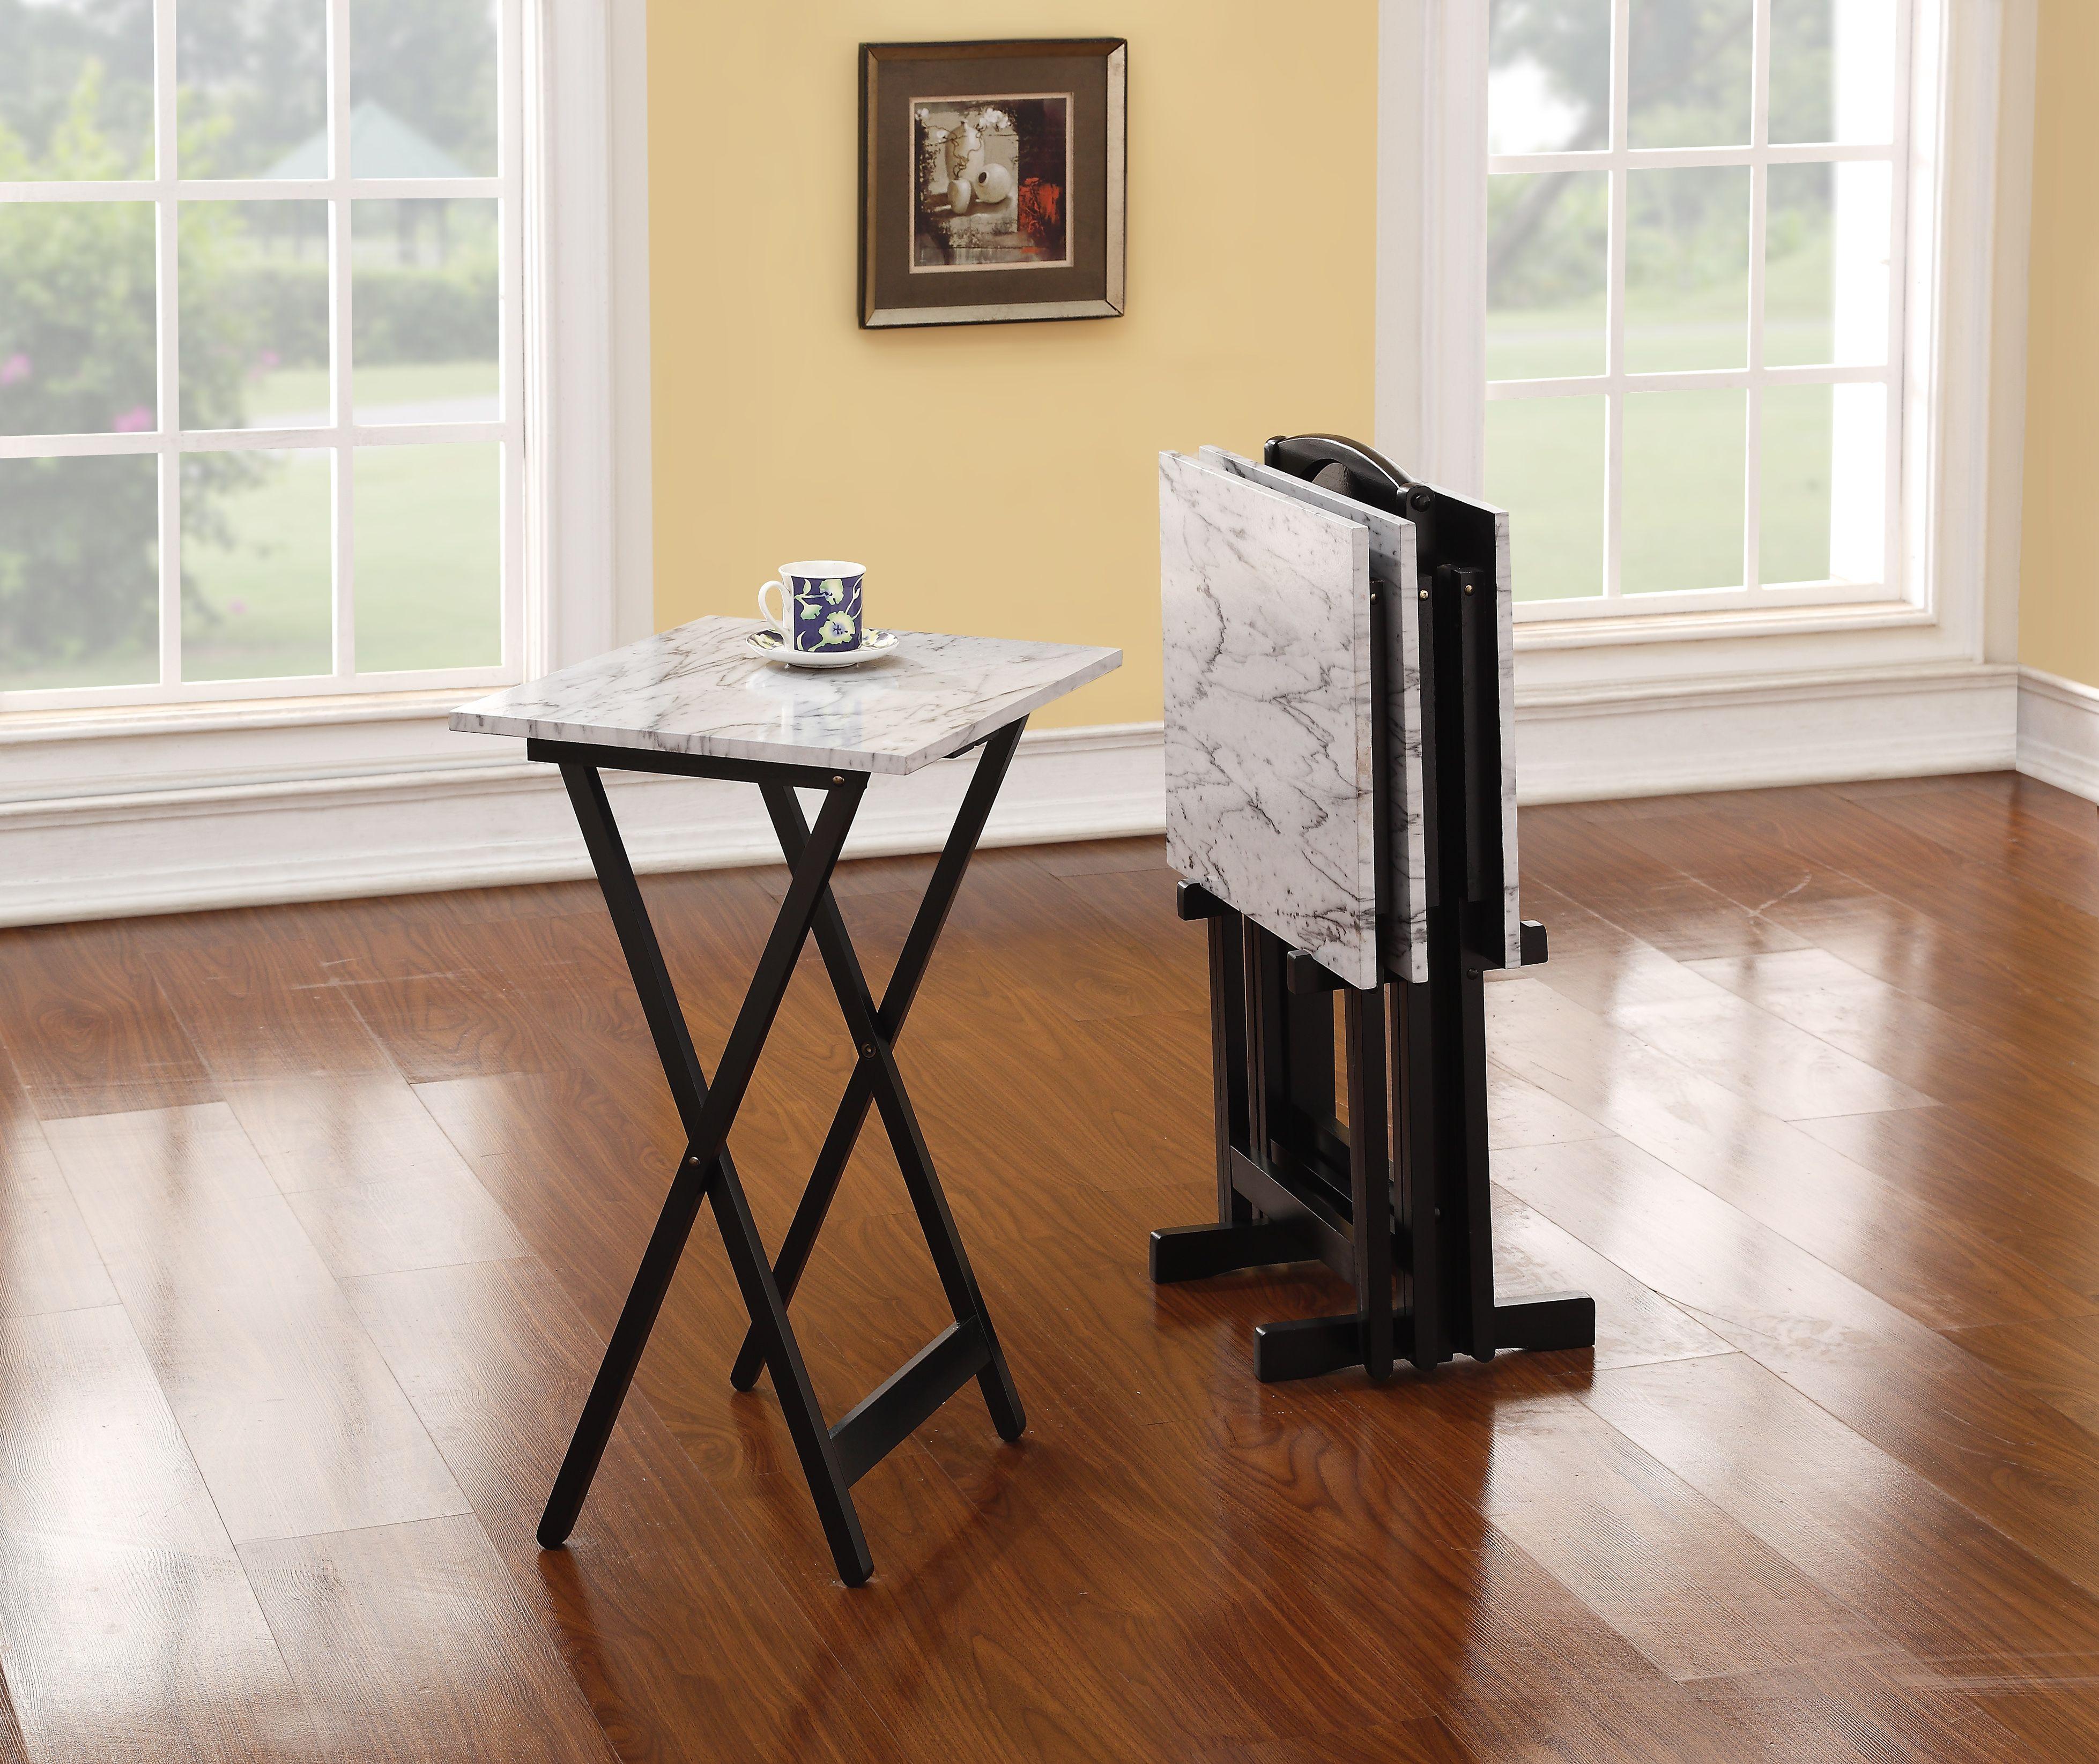 Linon White Faux Marble Tray Set Serving Trays Tv Tray Table Marble Tray Tray Table